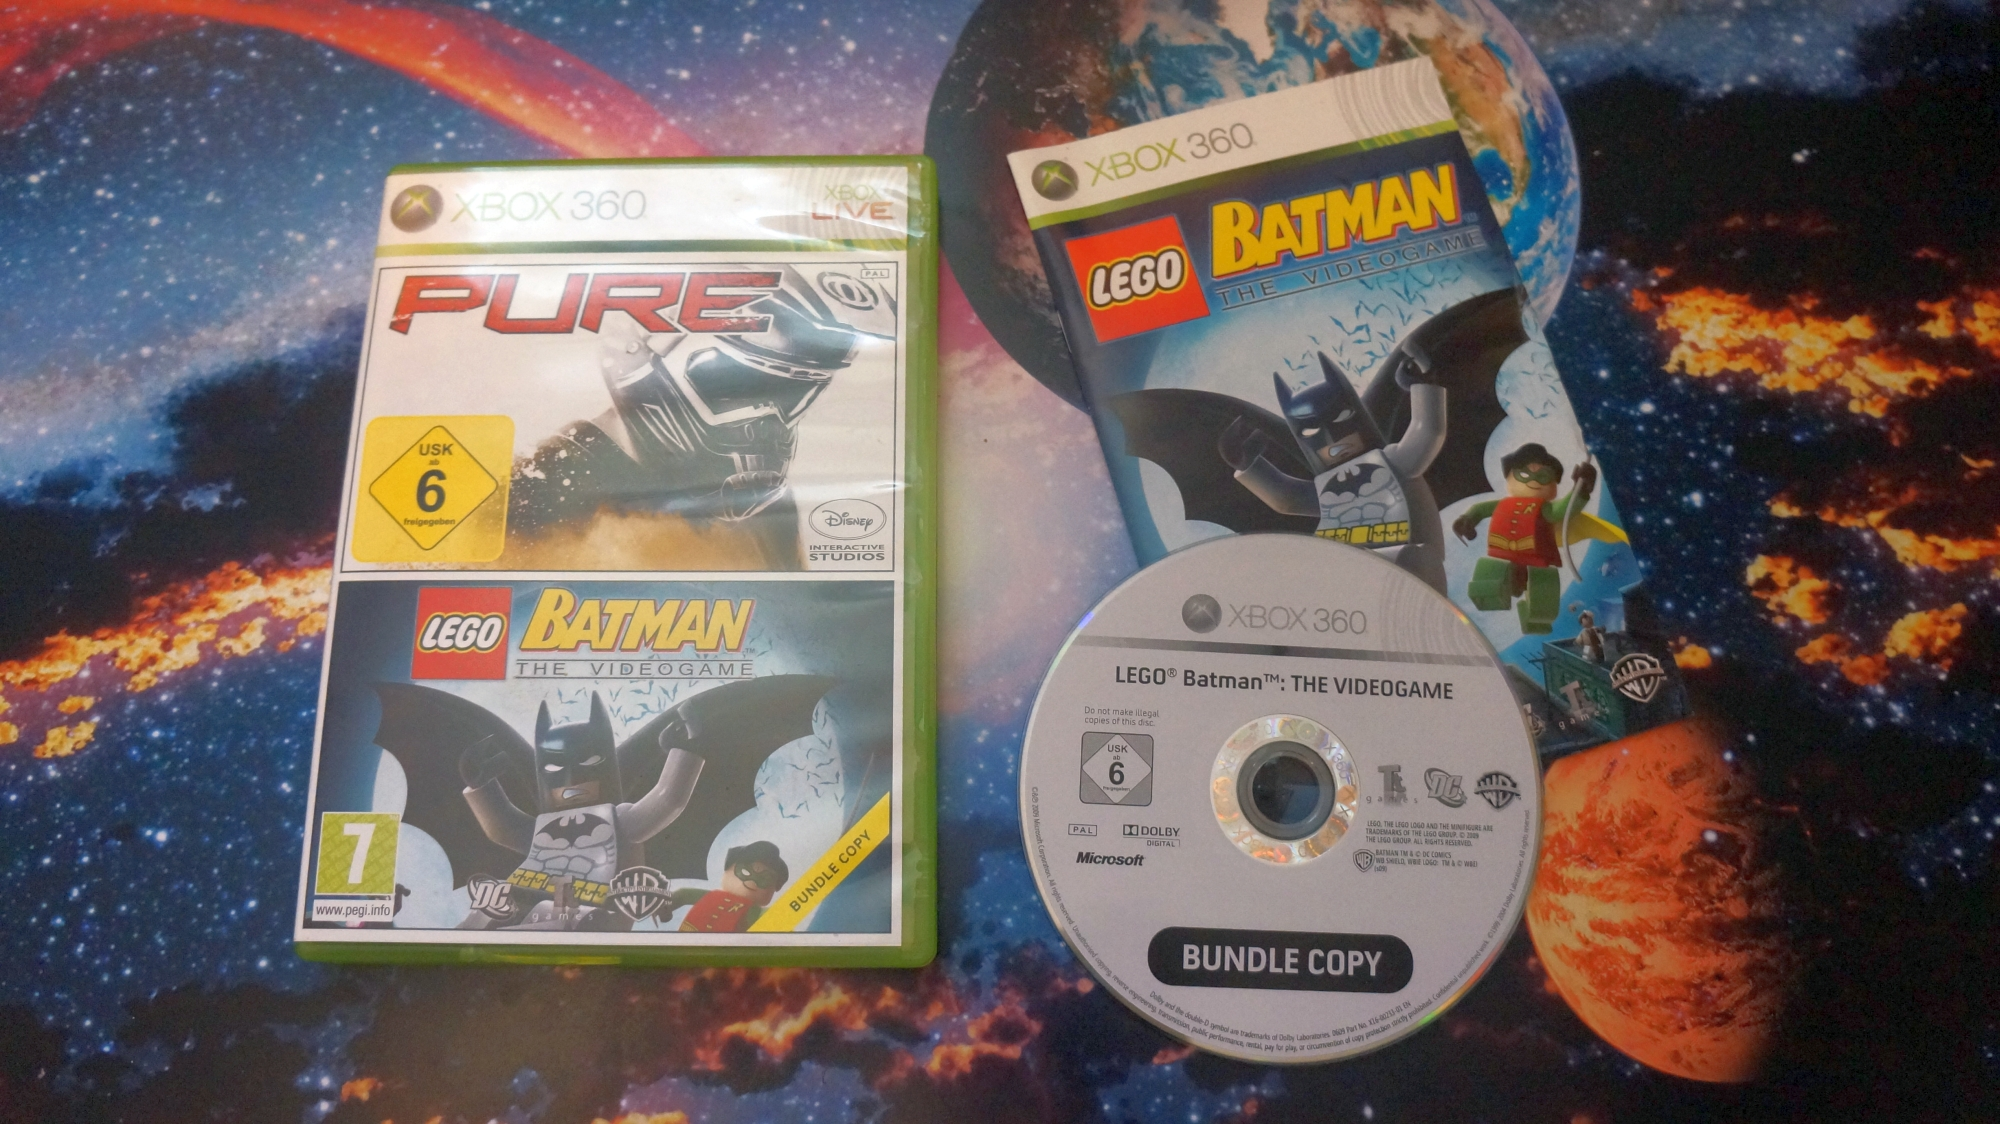 Игра для Xbox 360 LEGO Batman: The Videogame фото коробки и диска